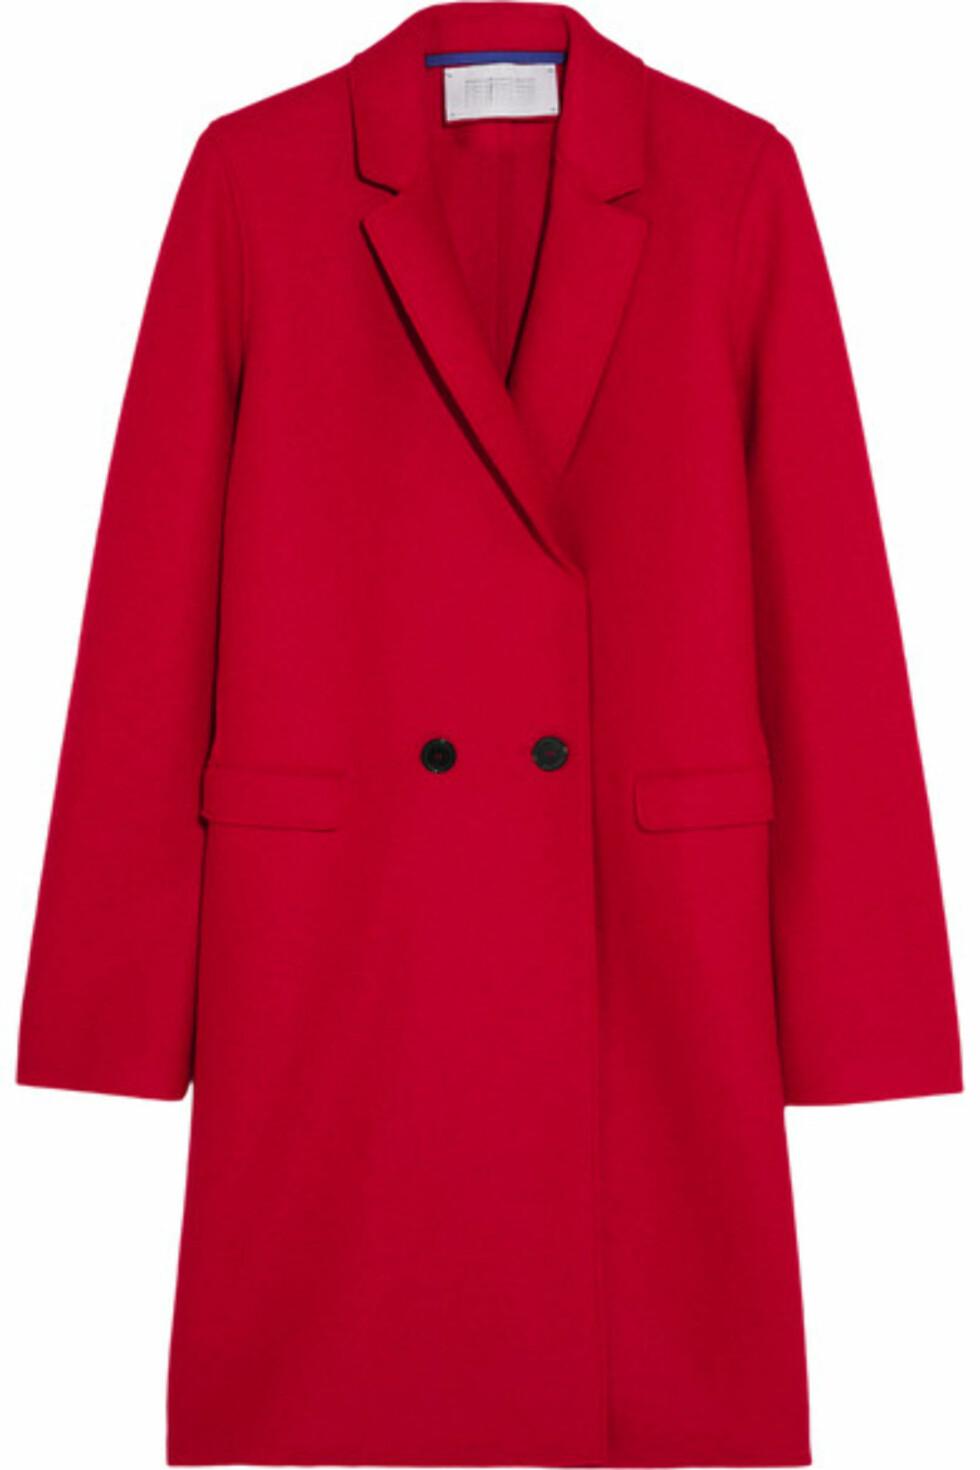 Kåpe fra Harris Wharf London via Net-a-porter.com | kr 2025 | https://www.net-a-porter.com/no/en/product/743130/harris_wharf_london/double-breasted-wool-felt-coat